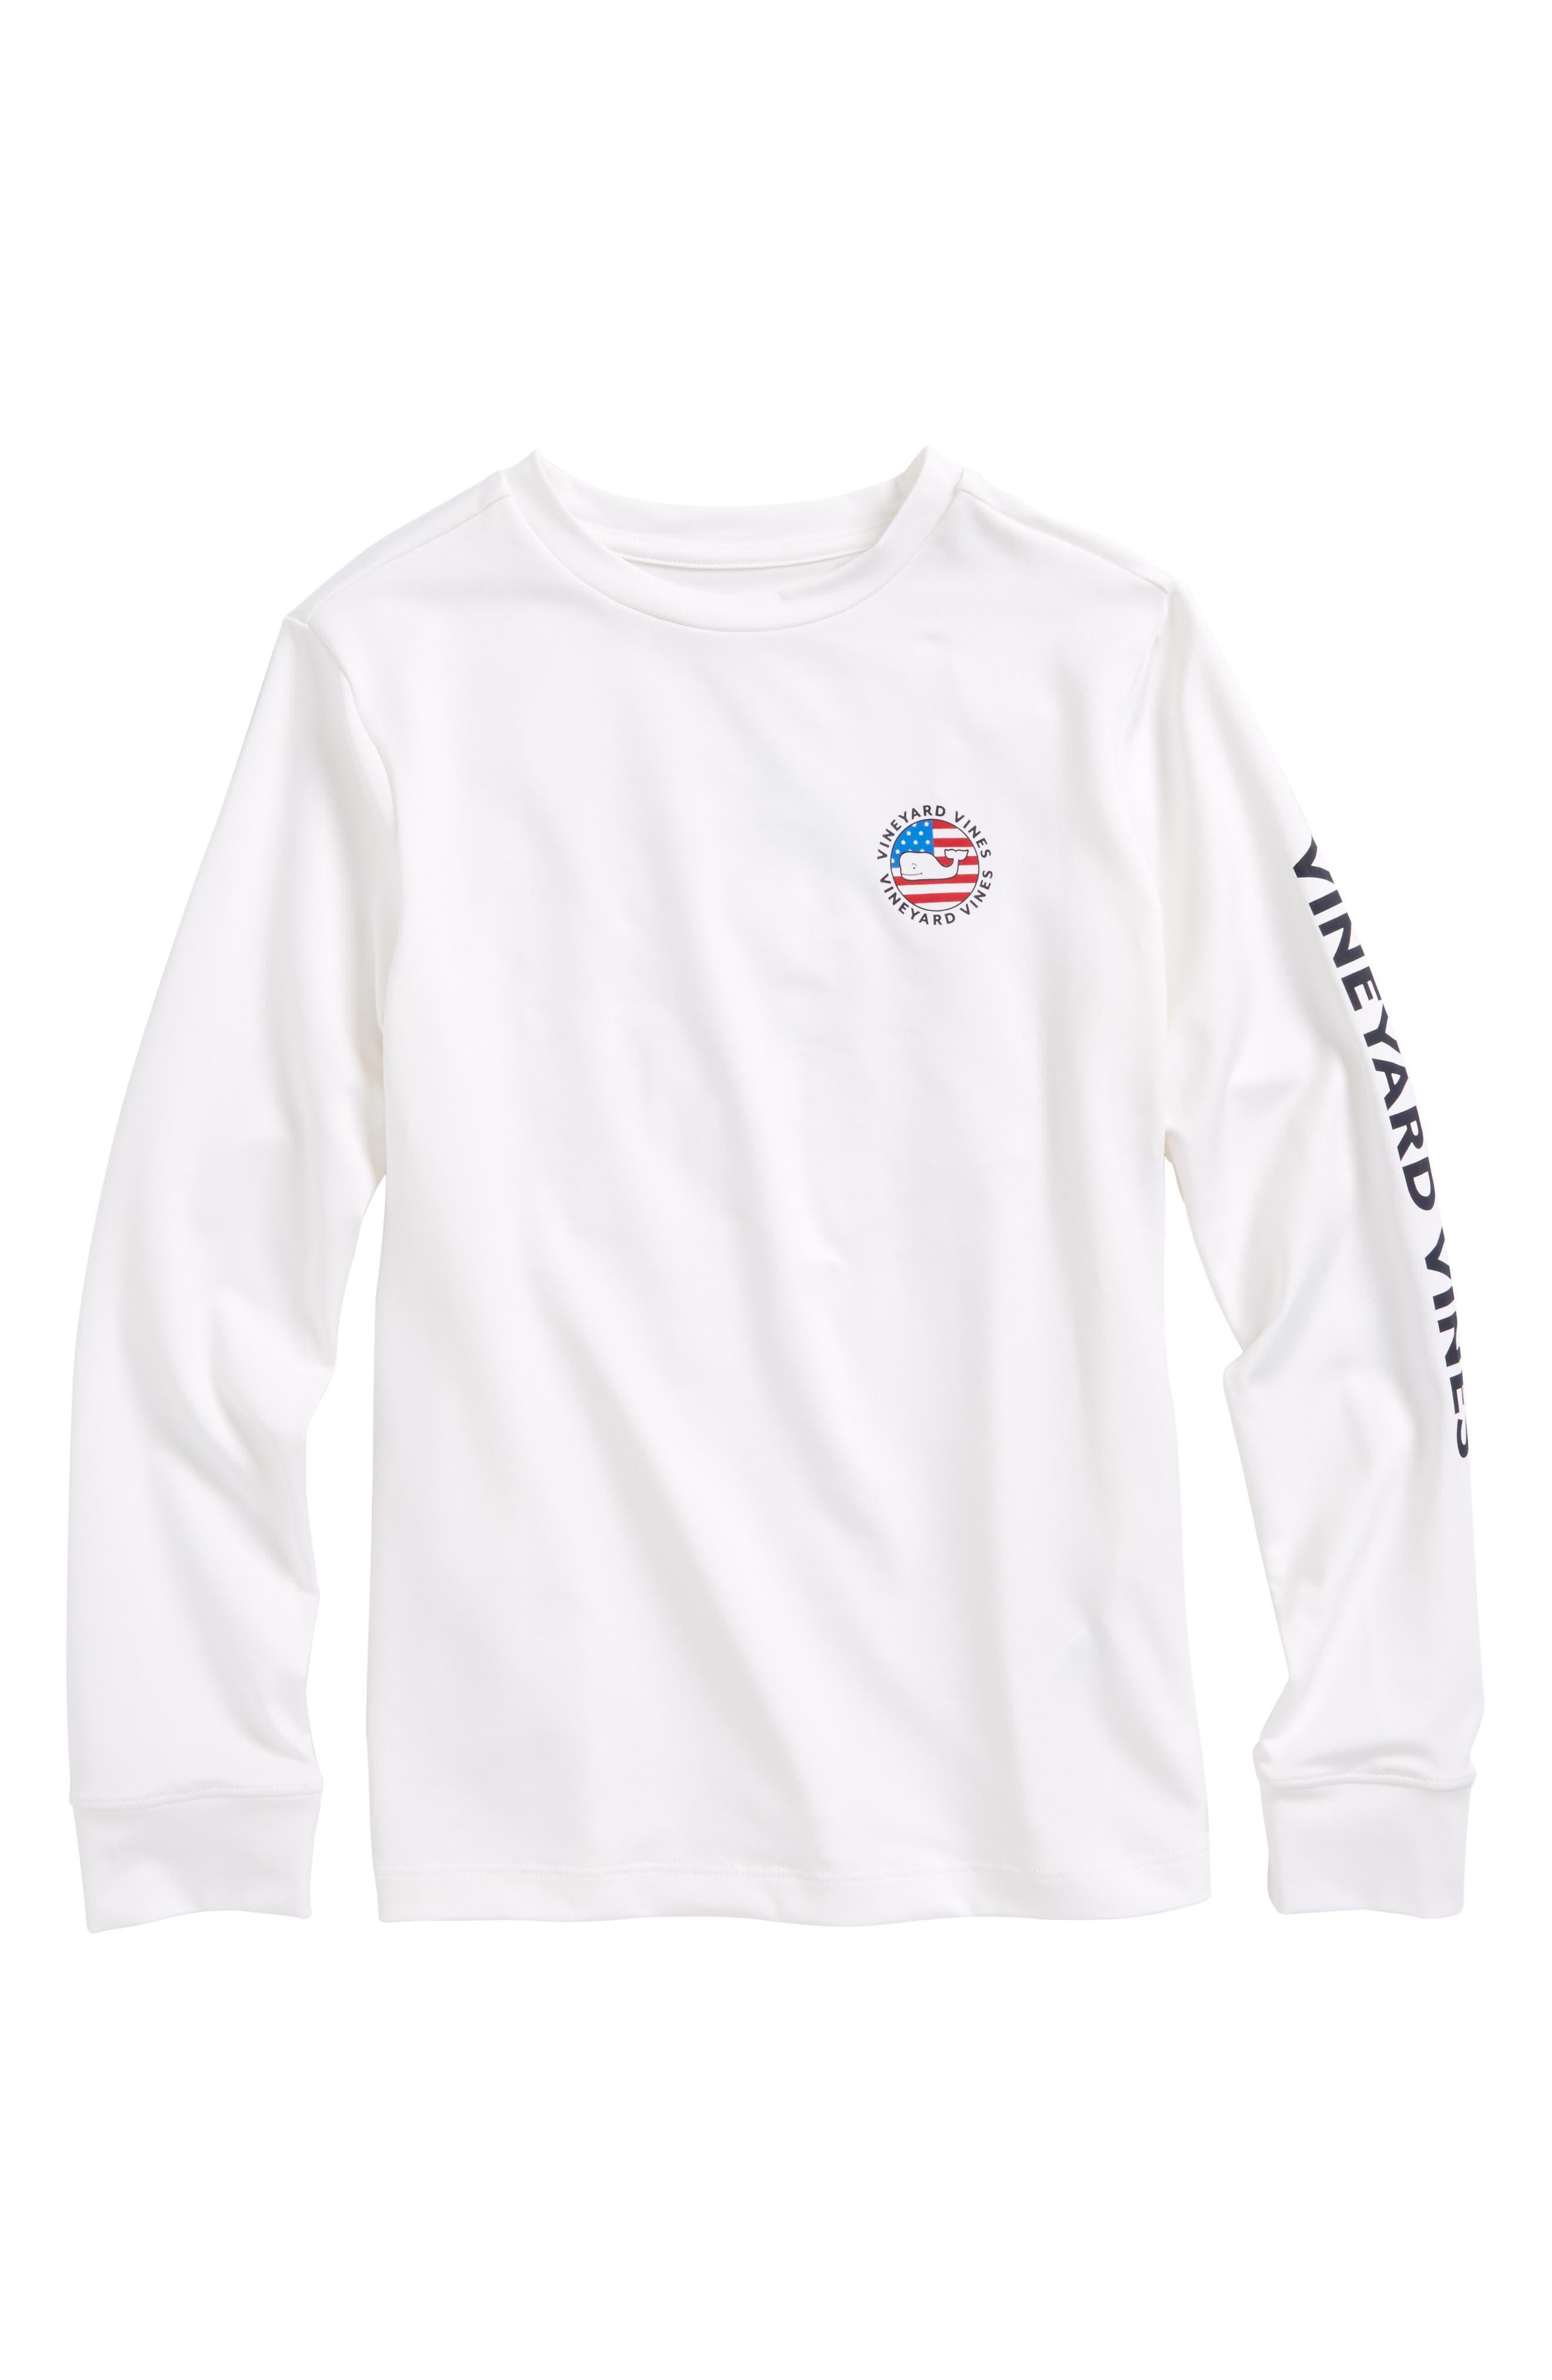 Performance Patriot Dot T-Shirt,                         Main,                         color, White Cap